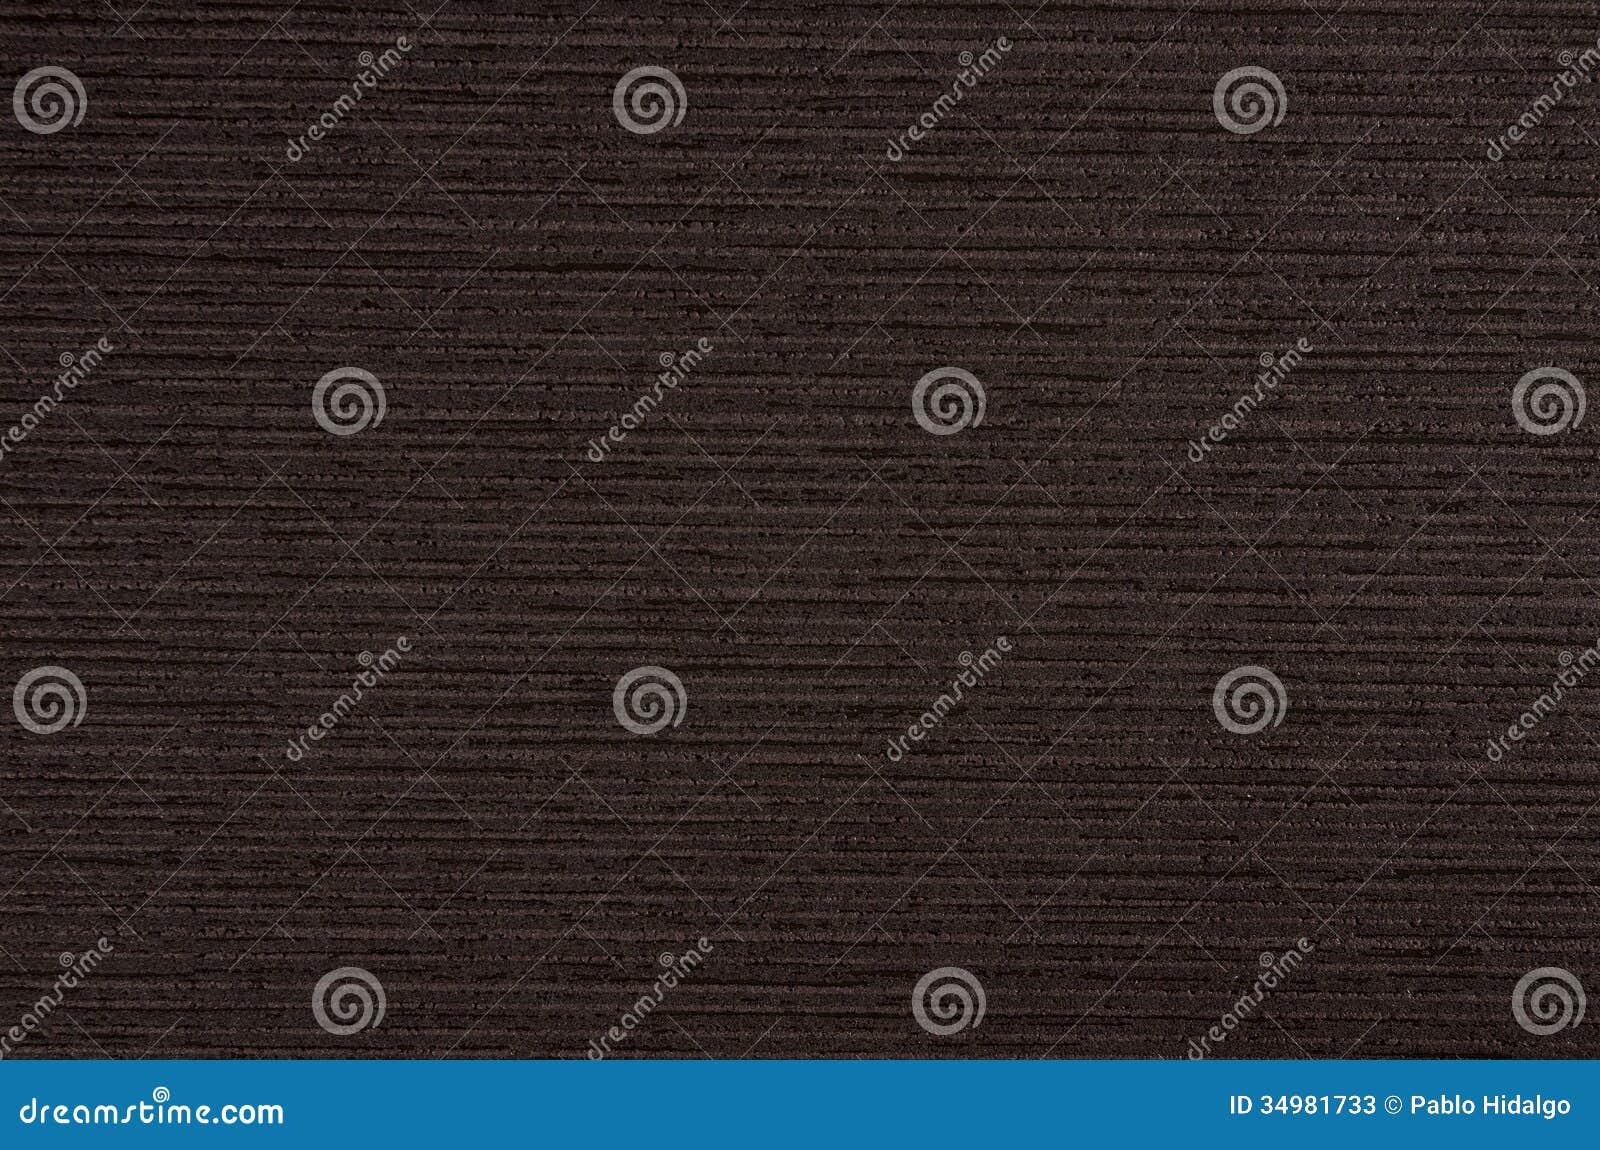 Wall Decor With Texture : Wall decor texture brown stock photos image